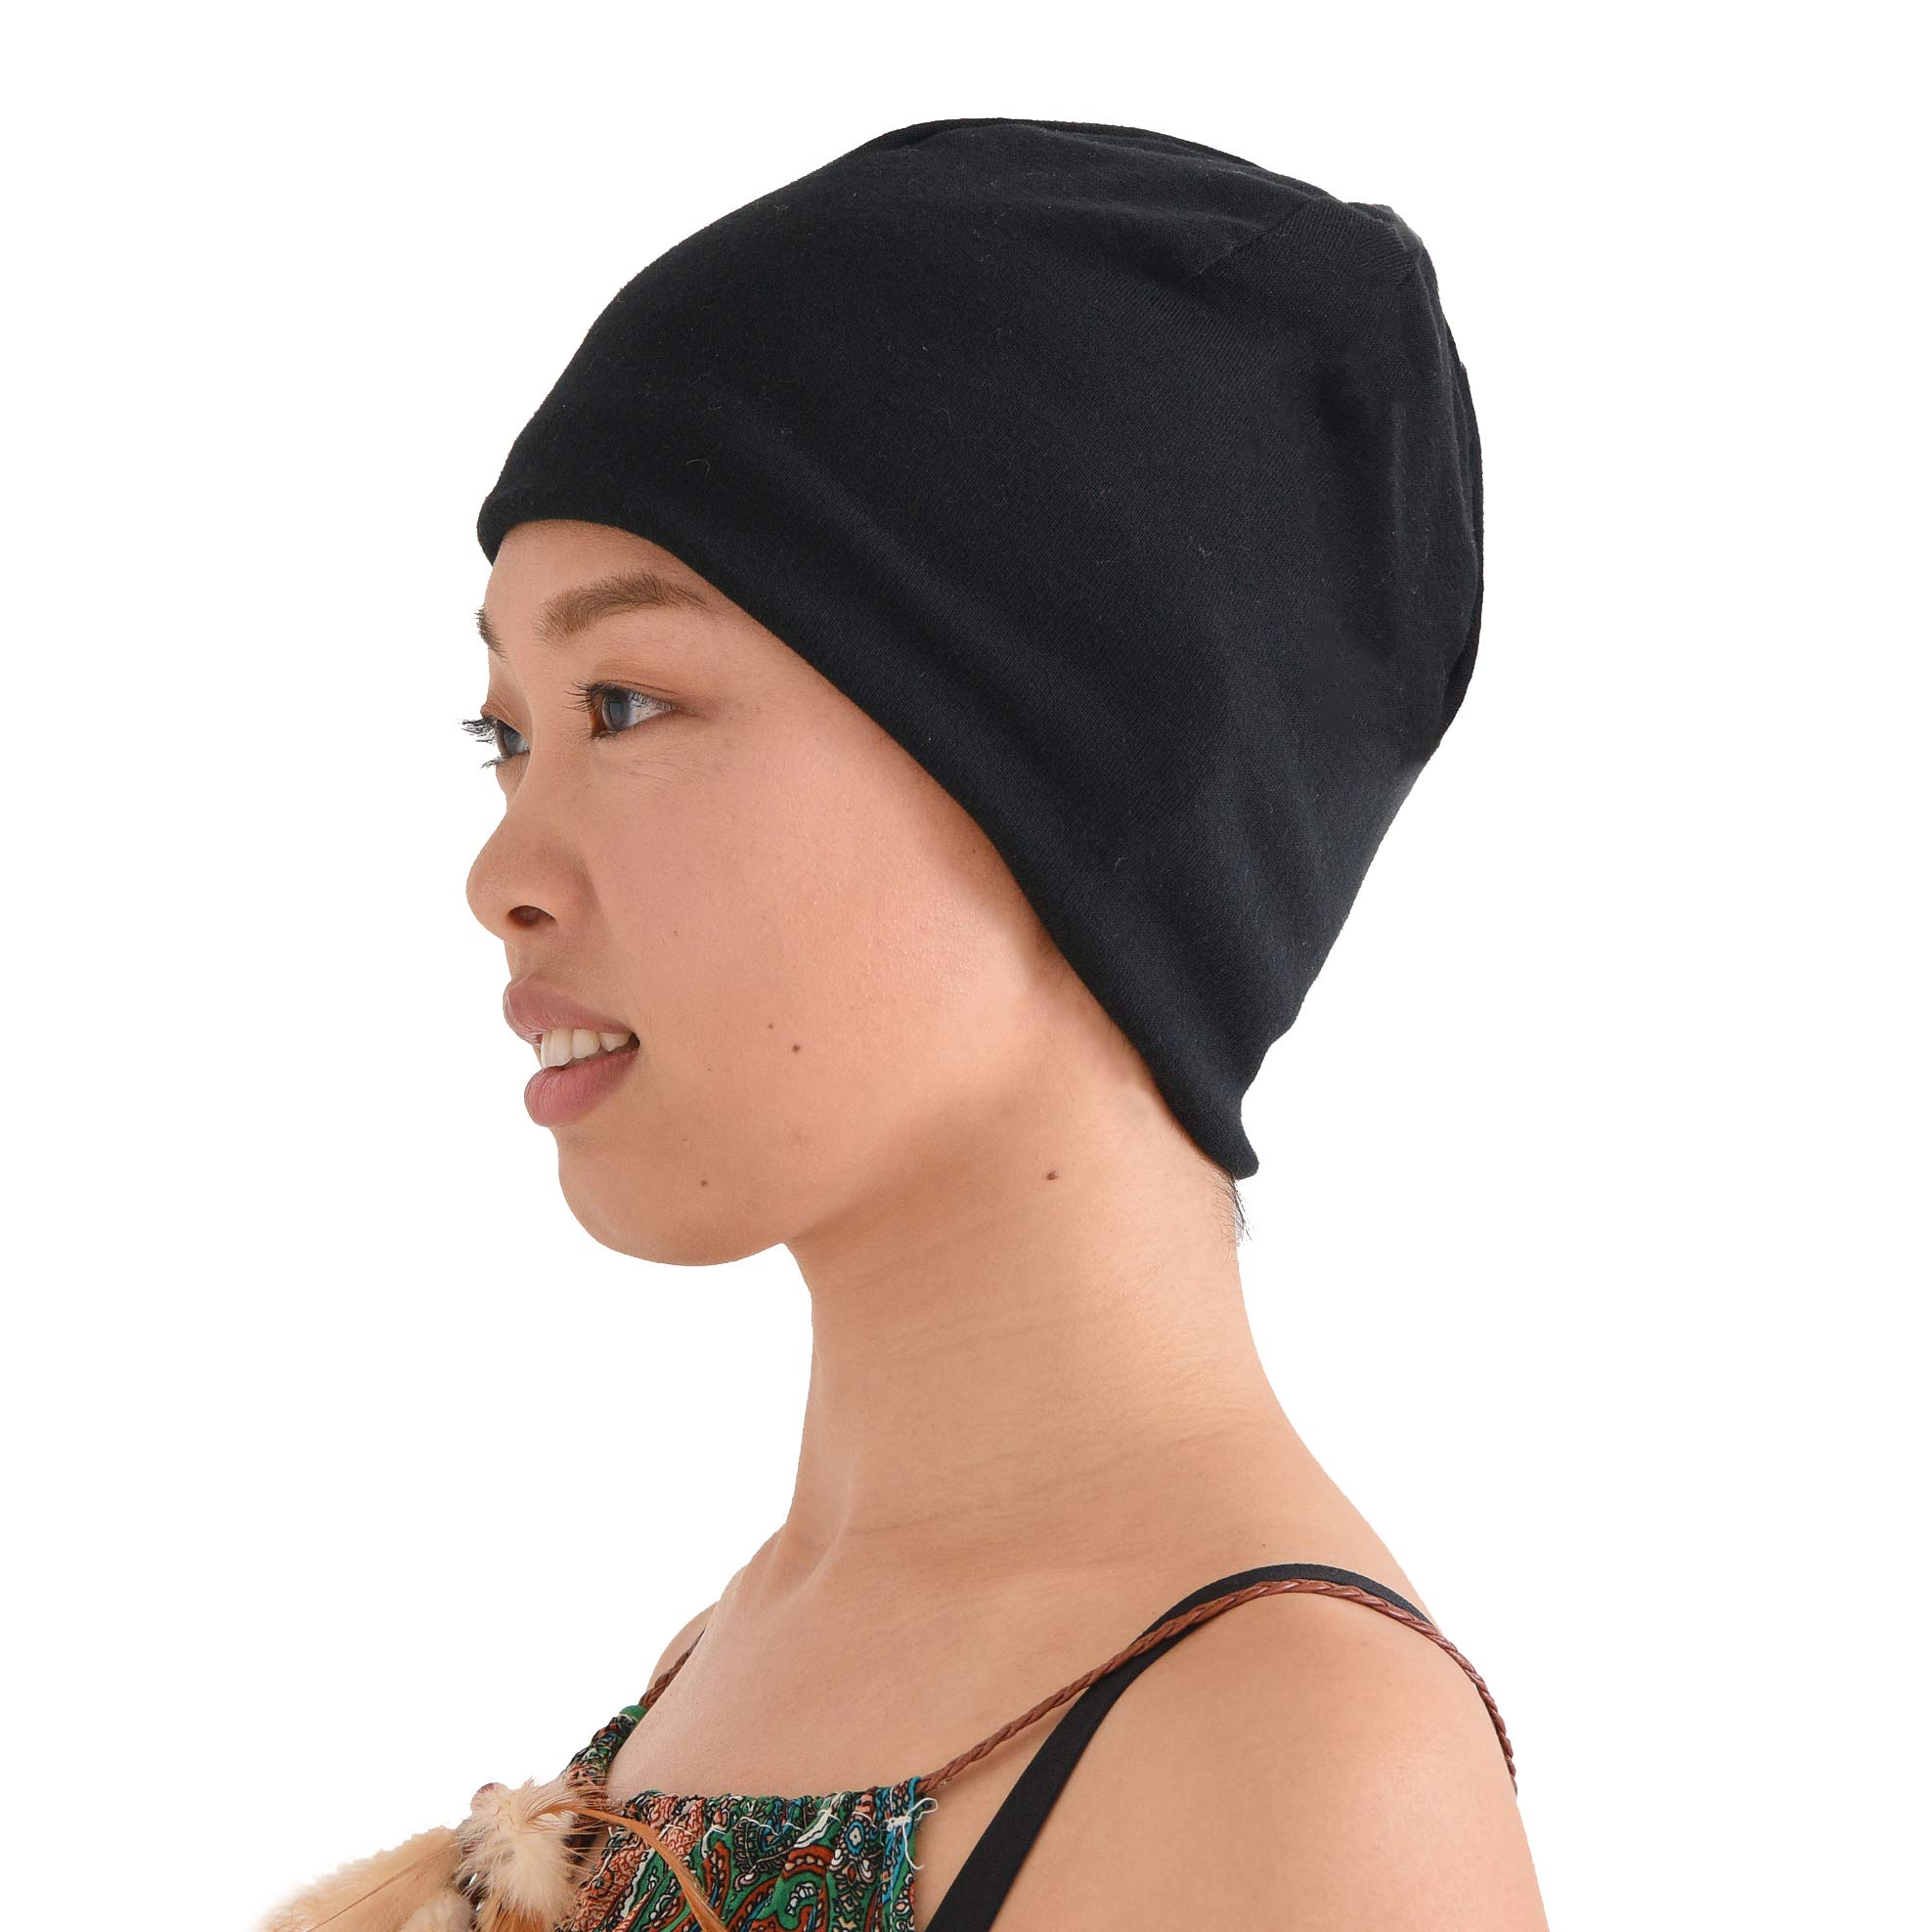 Organic Cotton Beanie Chemo Hat - Sensitive Skin Cap Medical Wear Snug Tight